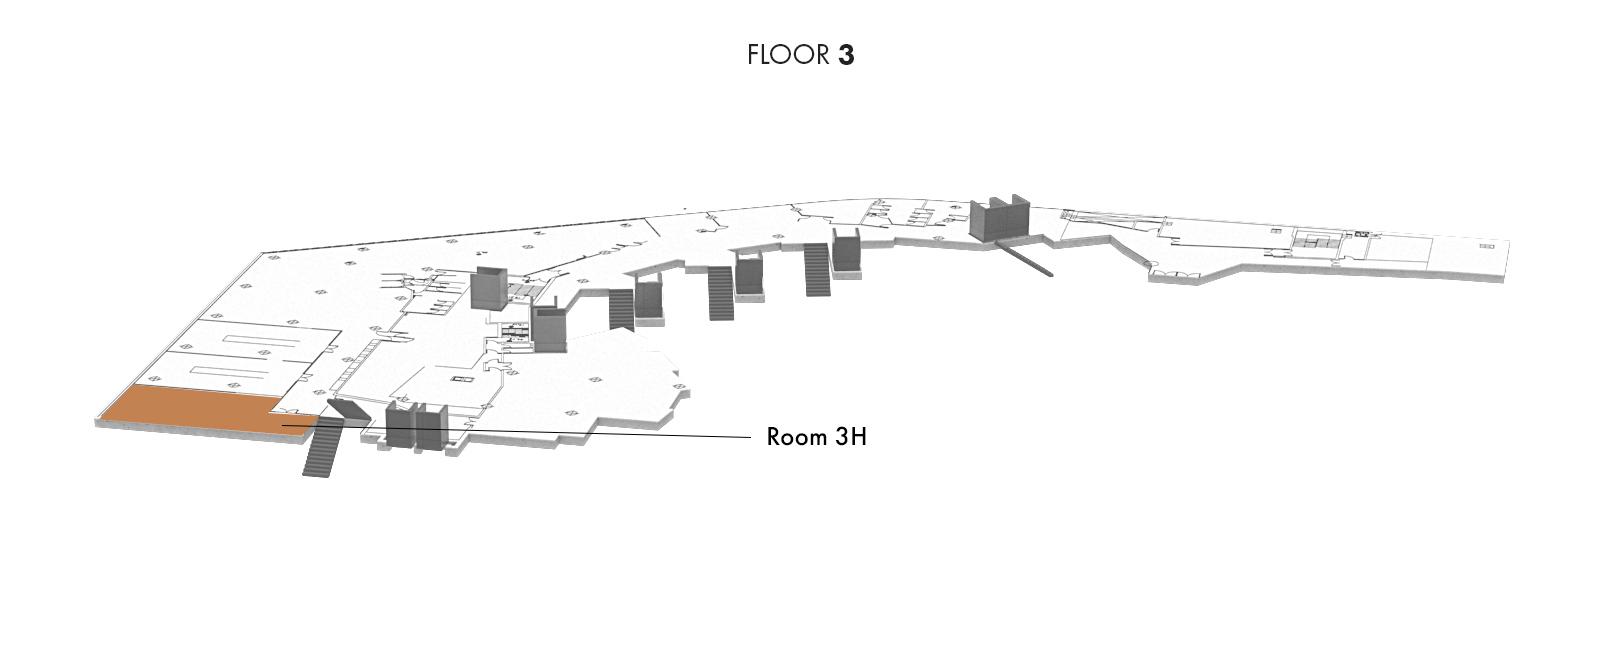 Room 3H, Floor 3   Palacio Euskalduna Jauregia